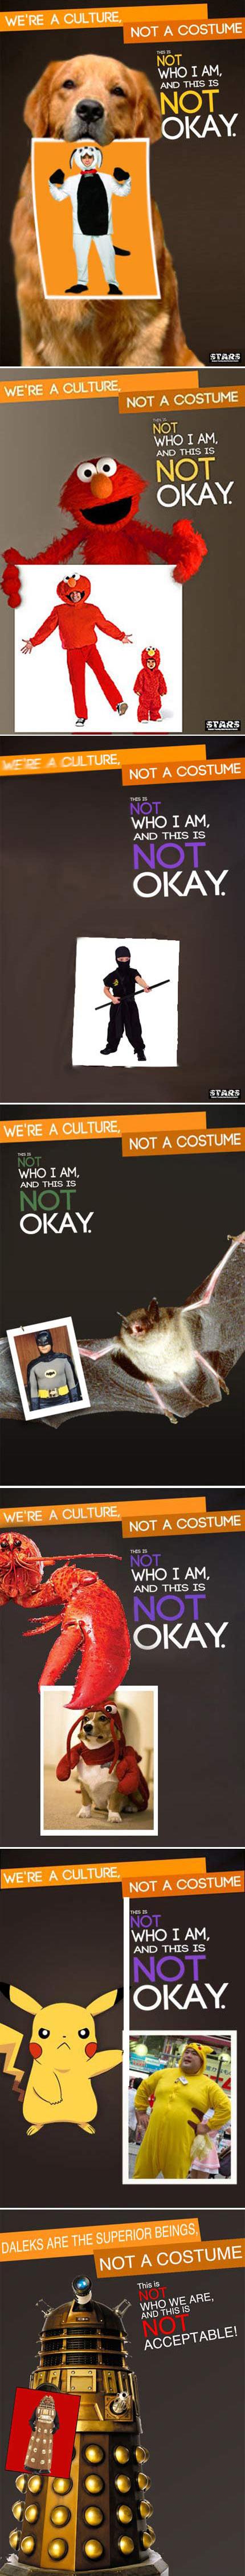 funny-Halloween-costume-culture-campaign